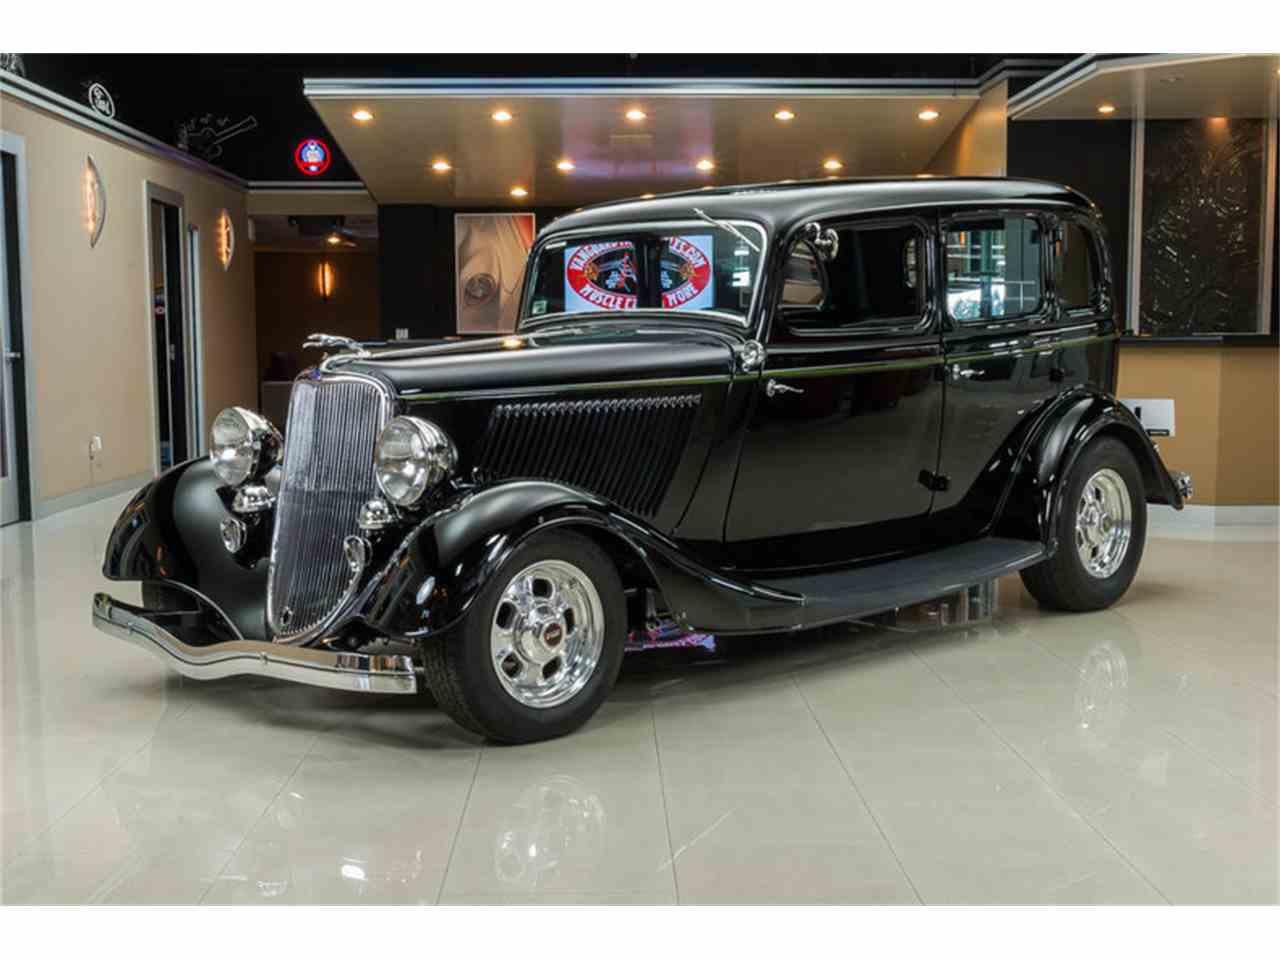 1933 ford sedan fordor street rod for sale classiccars for 1933 plymouth 4 door sedan for sale